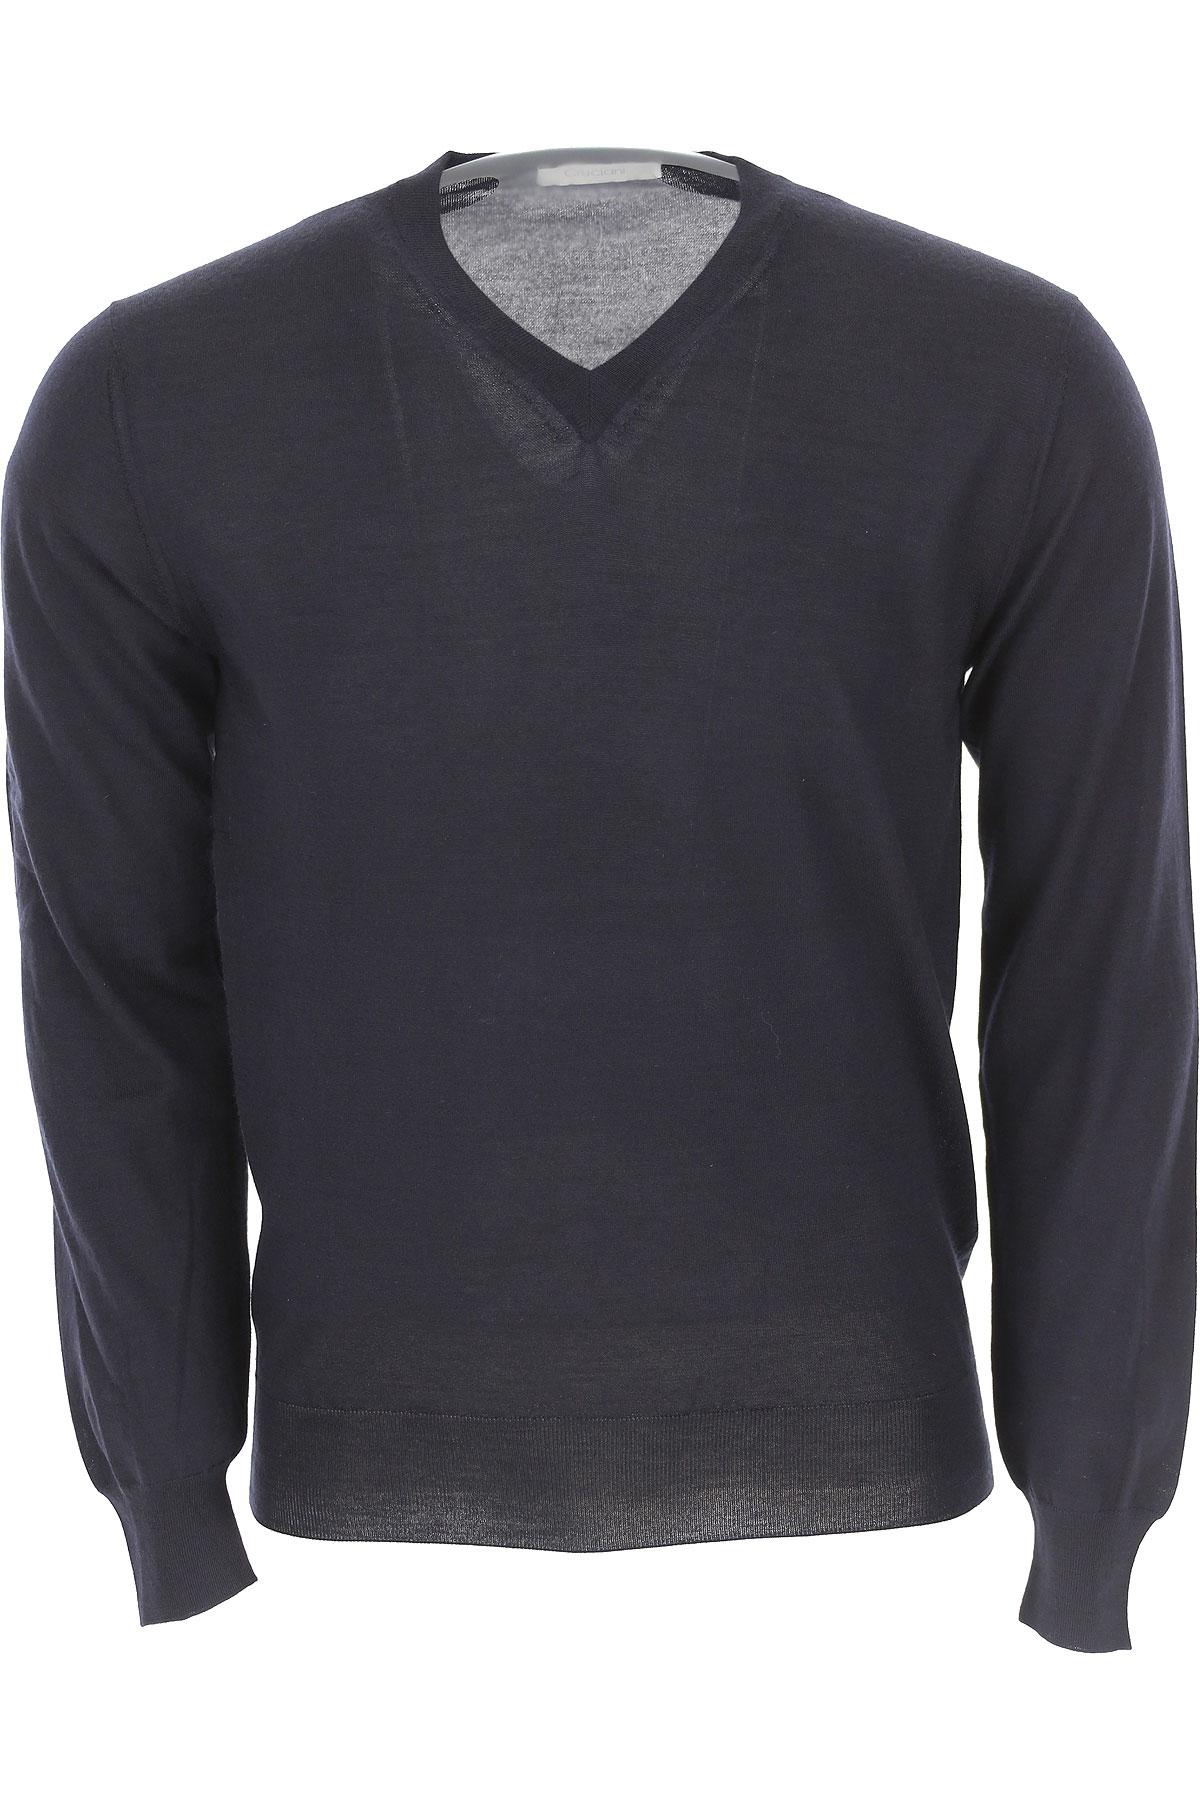 Image of Cruciani Sweater for Men Jumper, Blue Ink, Cashemere, 2017, L M XL